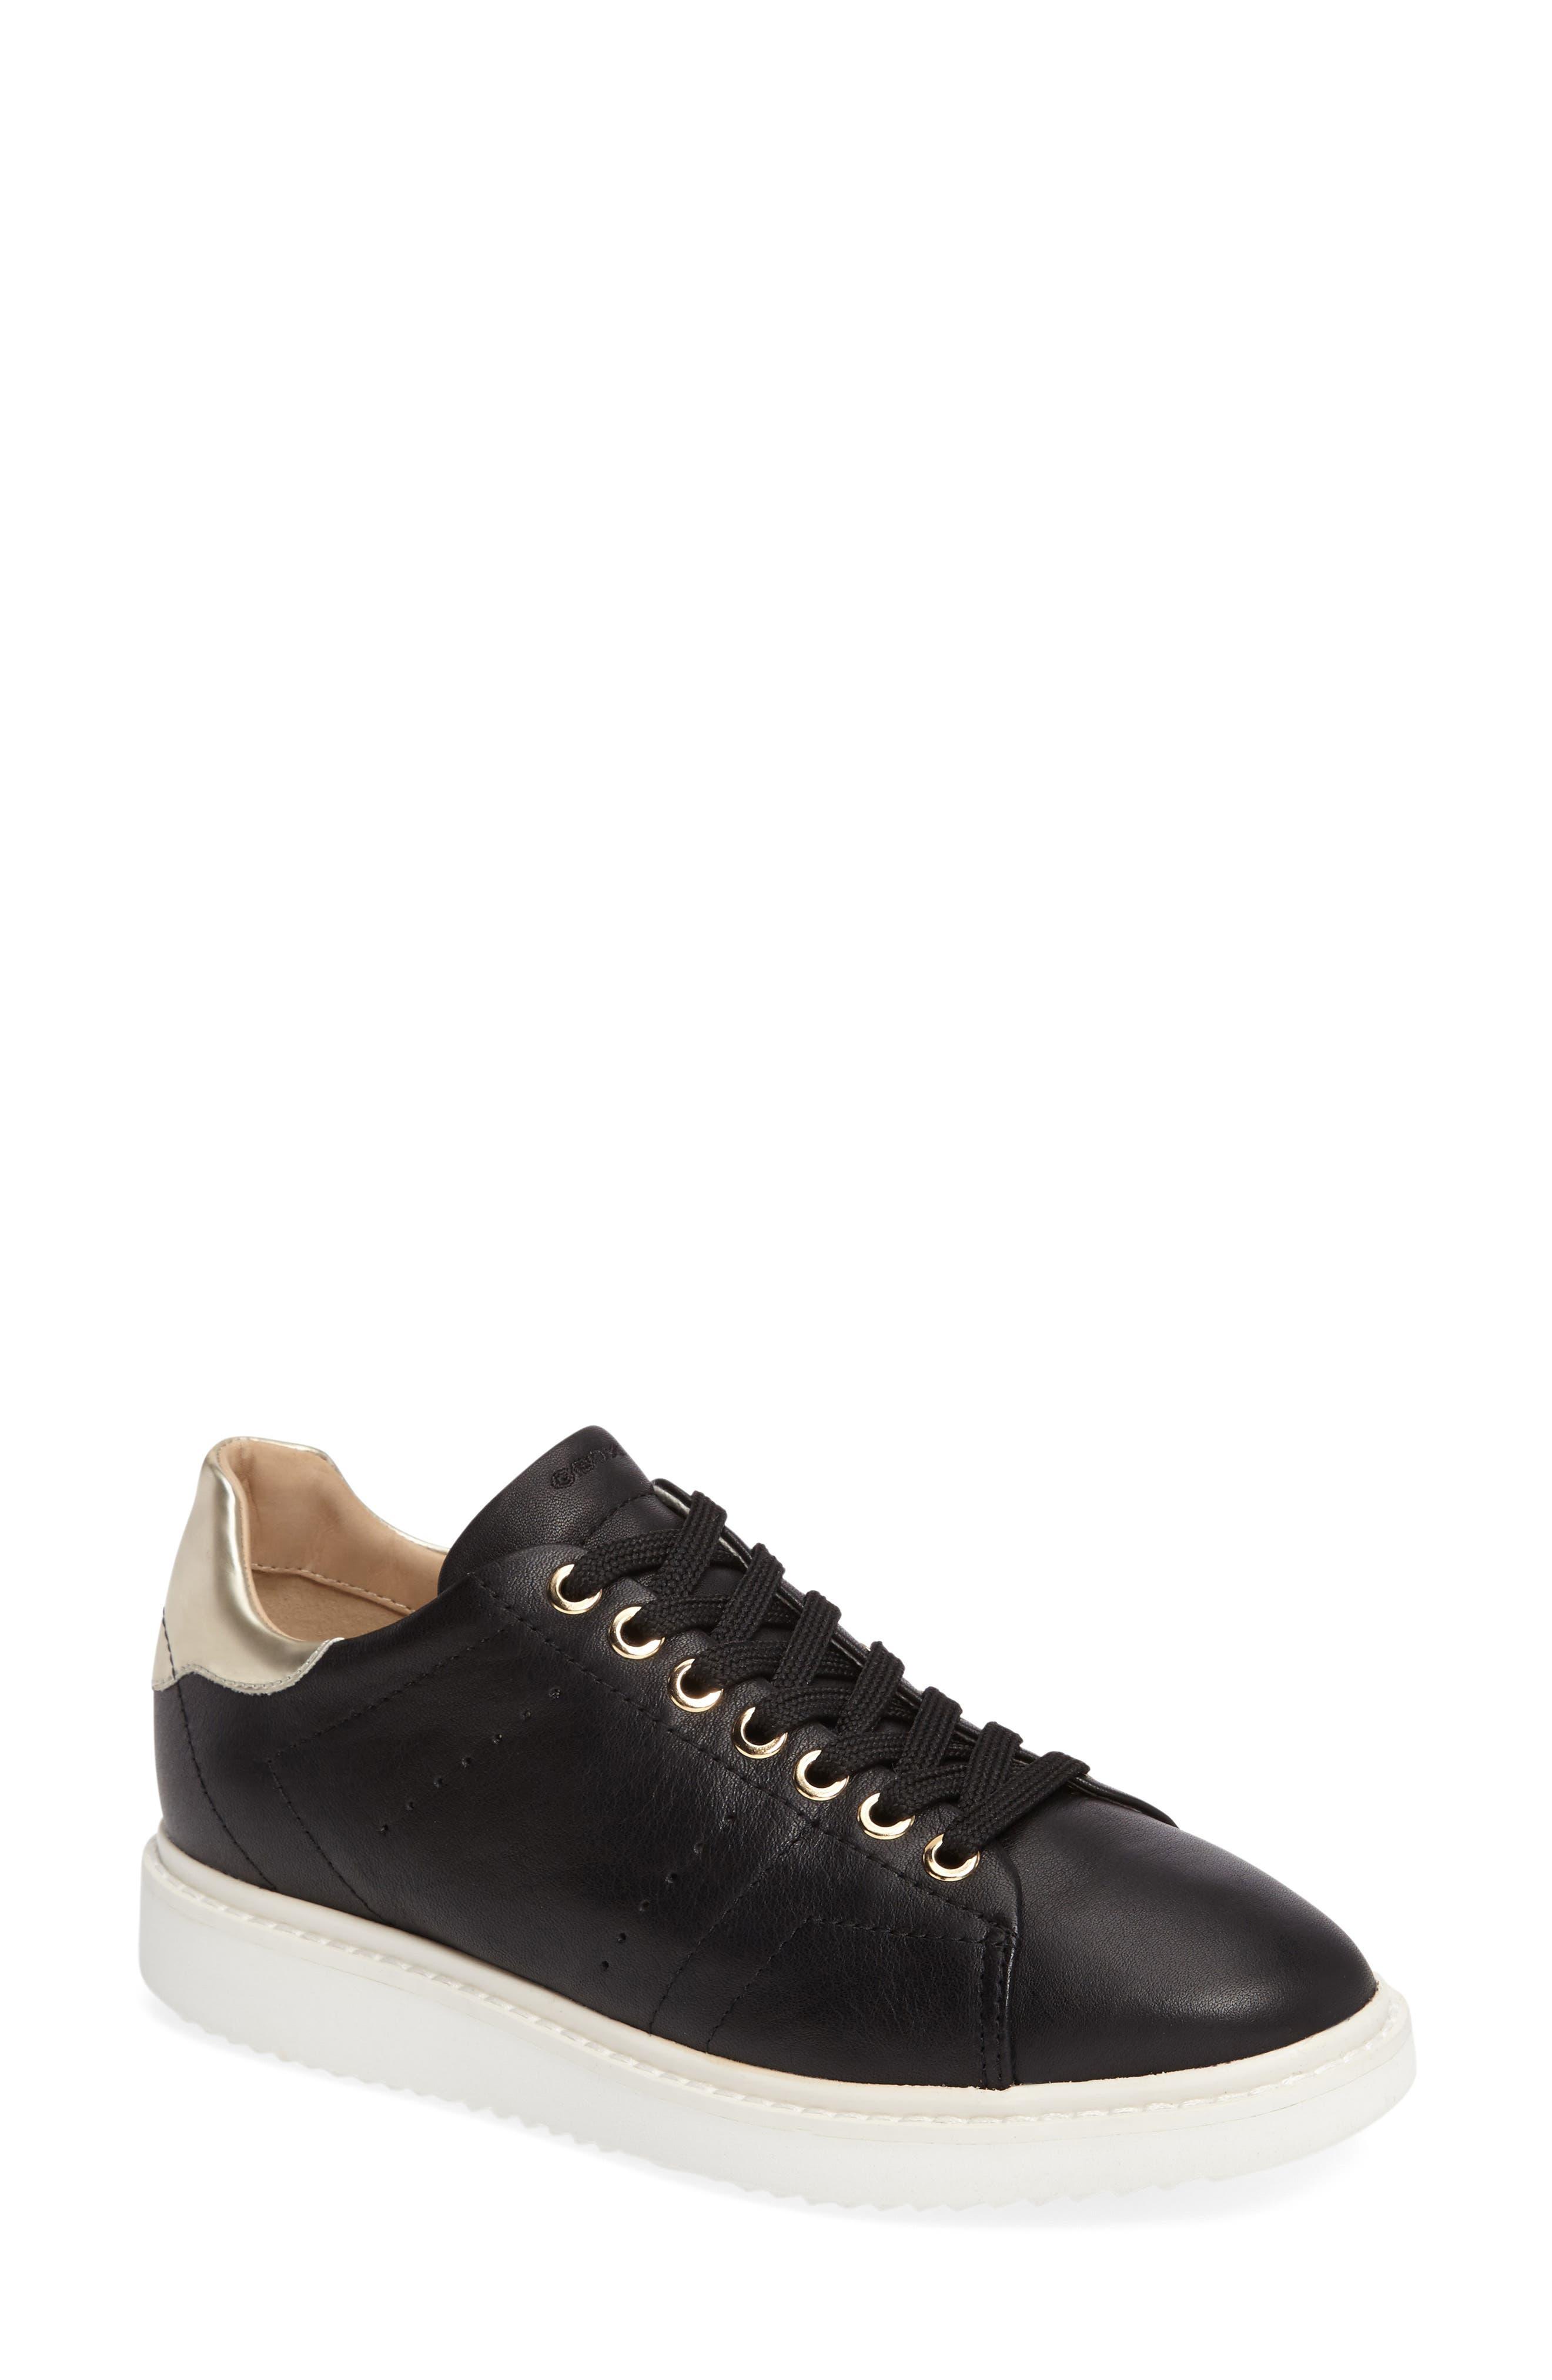 Thymar Sneaker,                             Main thumbnail 1, color,                             Black Leather